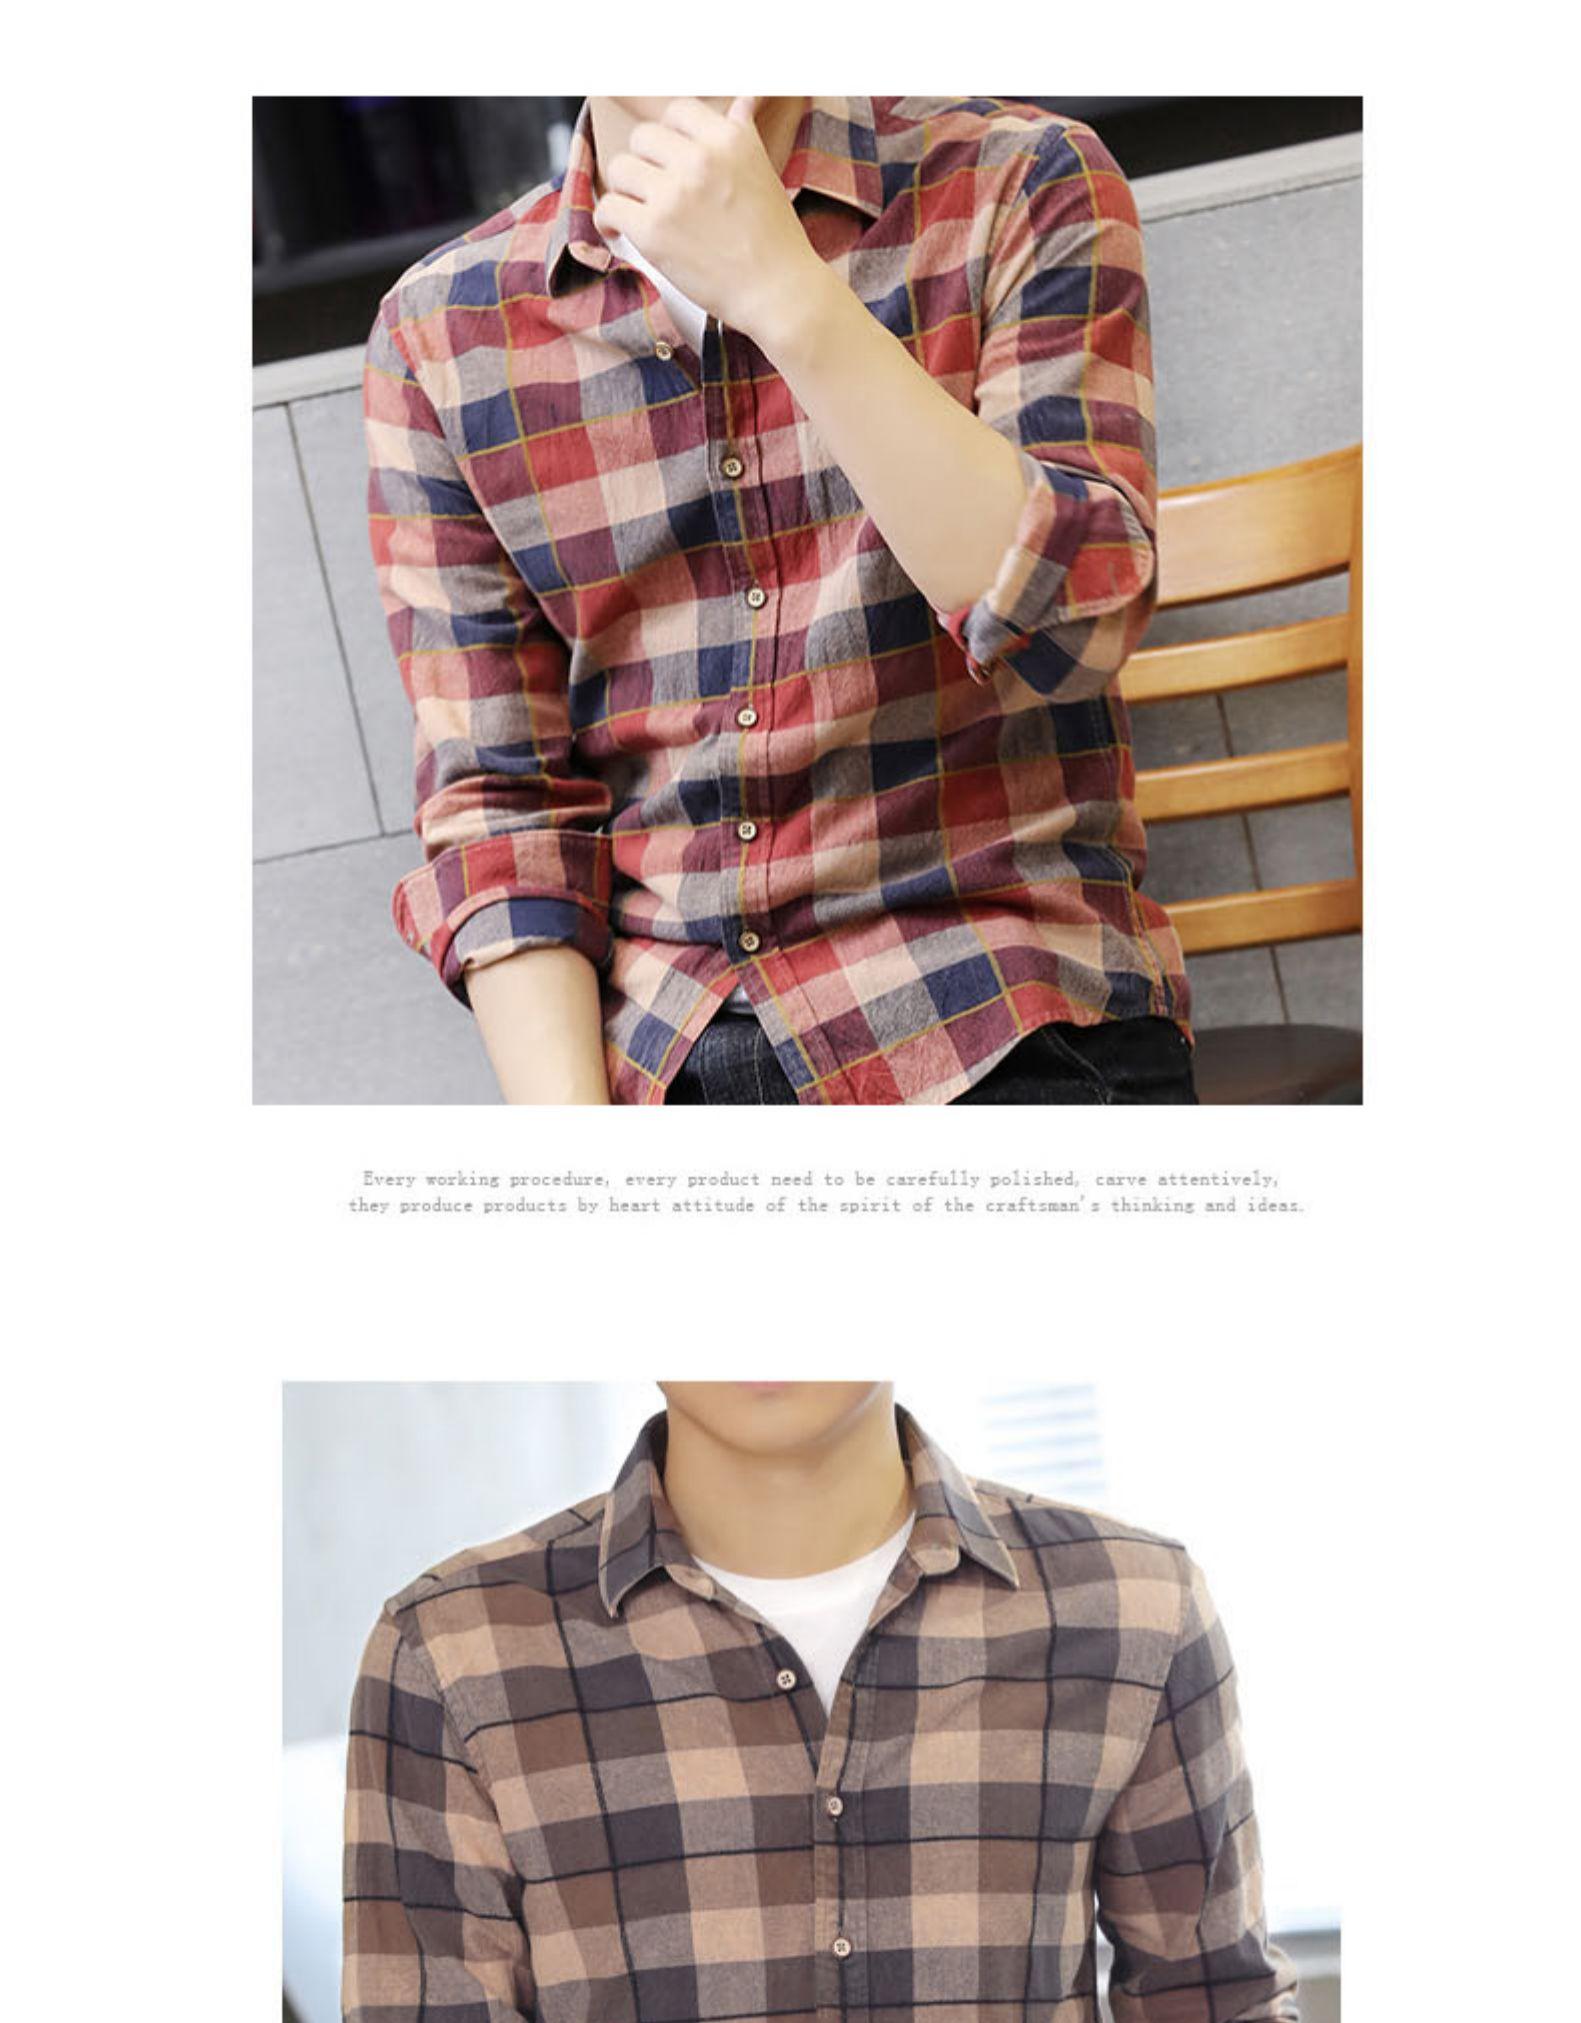 Autumn pure cotton lad shirt men's Korean version of the trend autumn fashion slim long-sleeved shirt men's handsome jacket 57 Online shopping Bangladesh